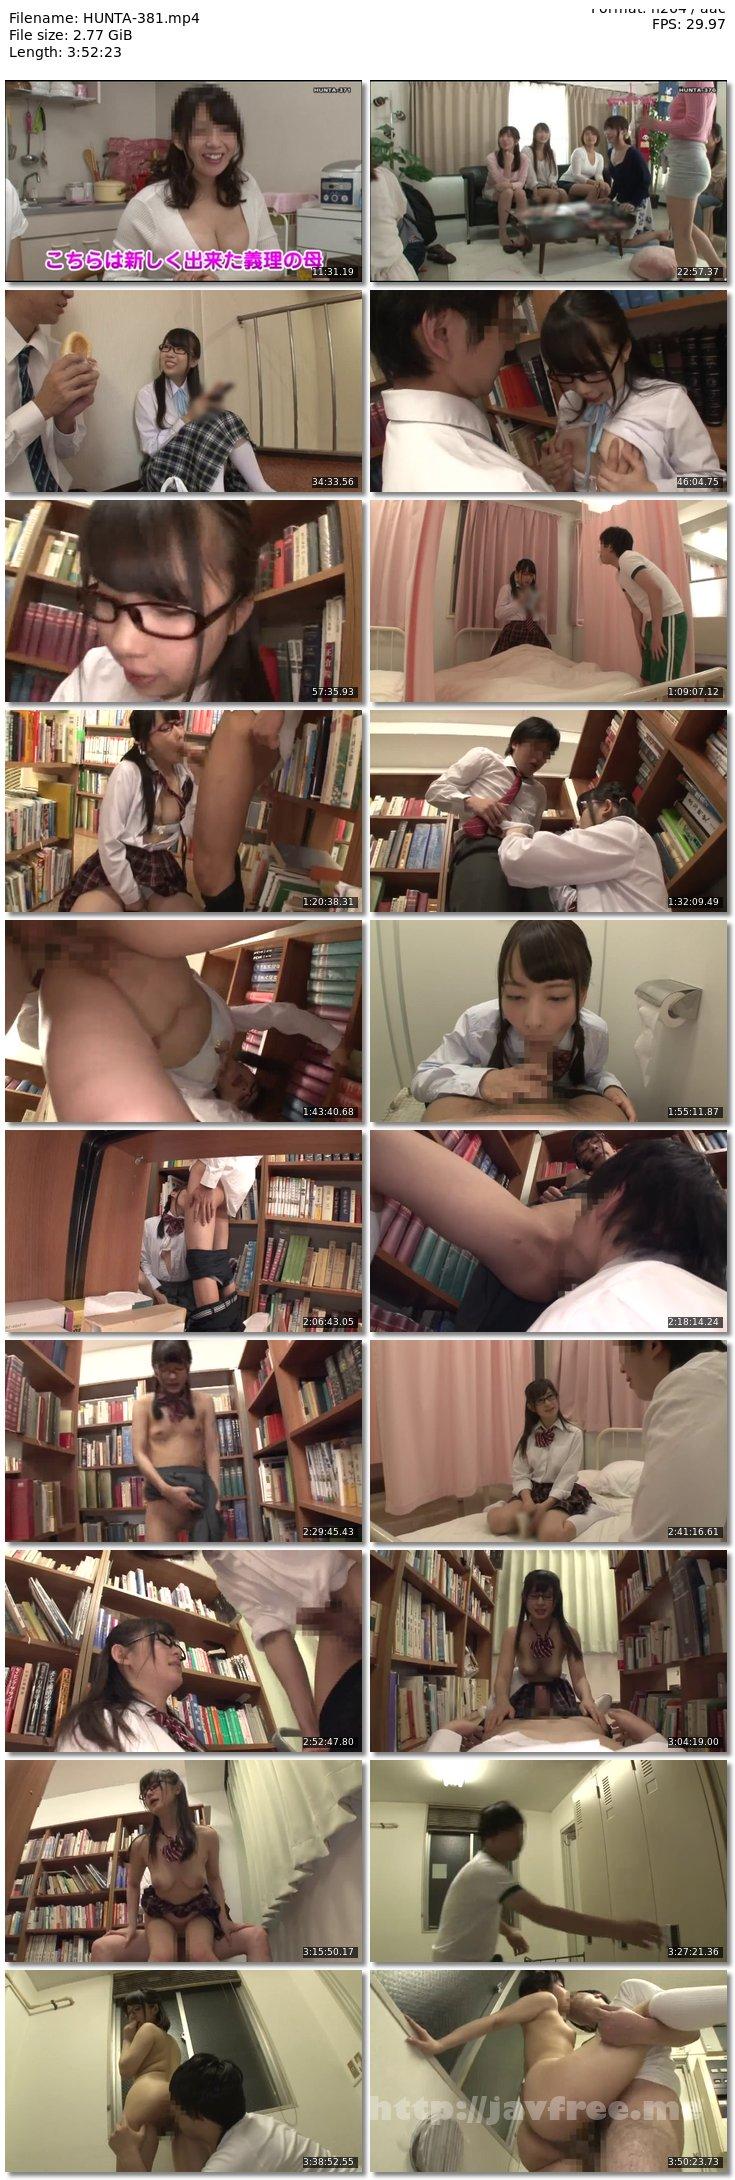 [MDVR-014] 【VR】MOODYZ VR 秋山祥子とSEXしてみませんか? 秋山祥子 - image HUNTA-381 on http://javcc.com